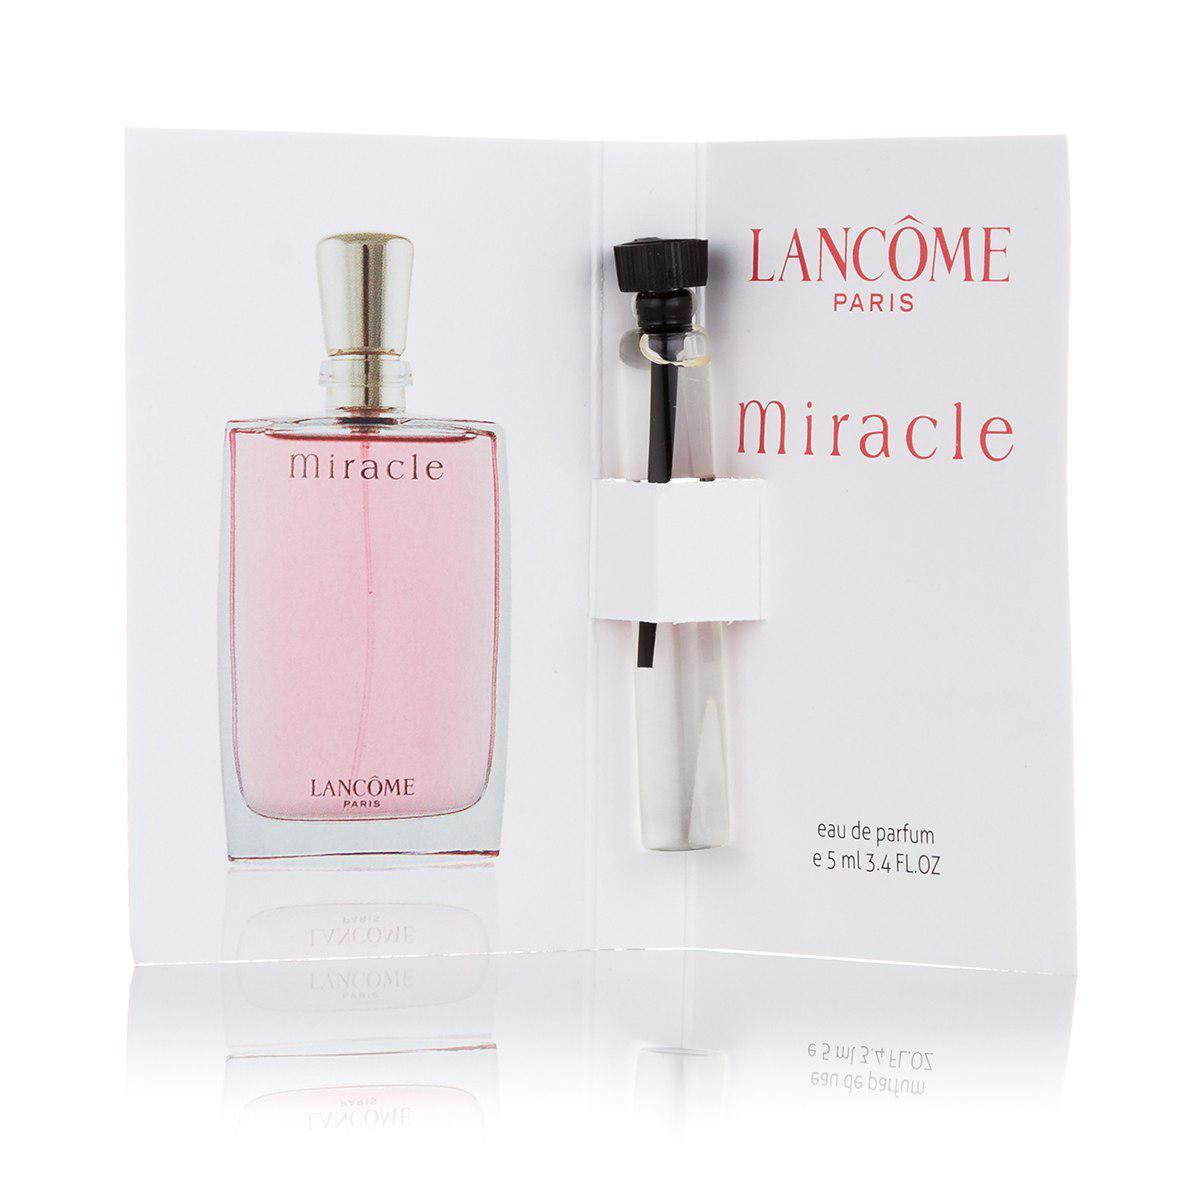 Lancome Miracle (ж) 5 ml